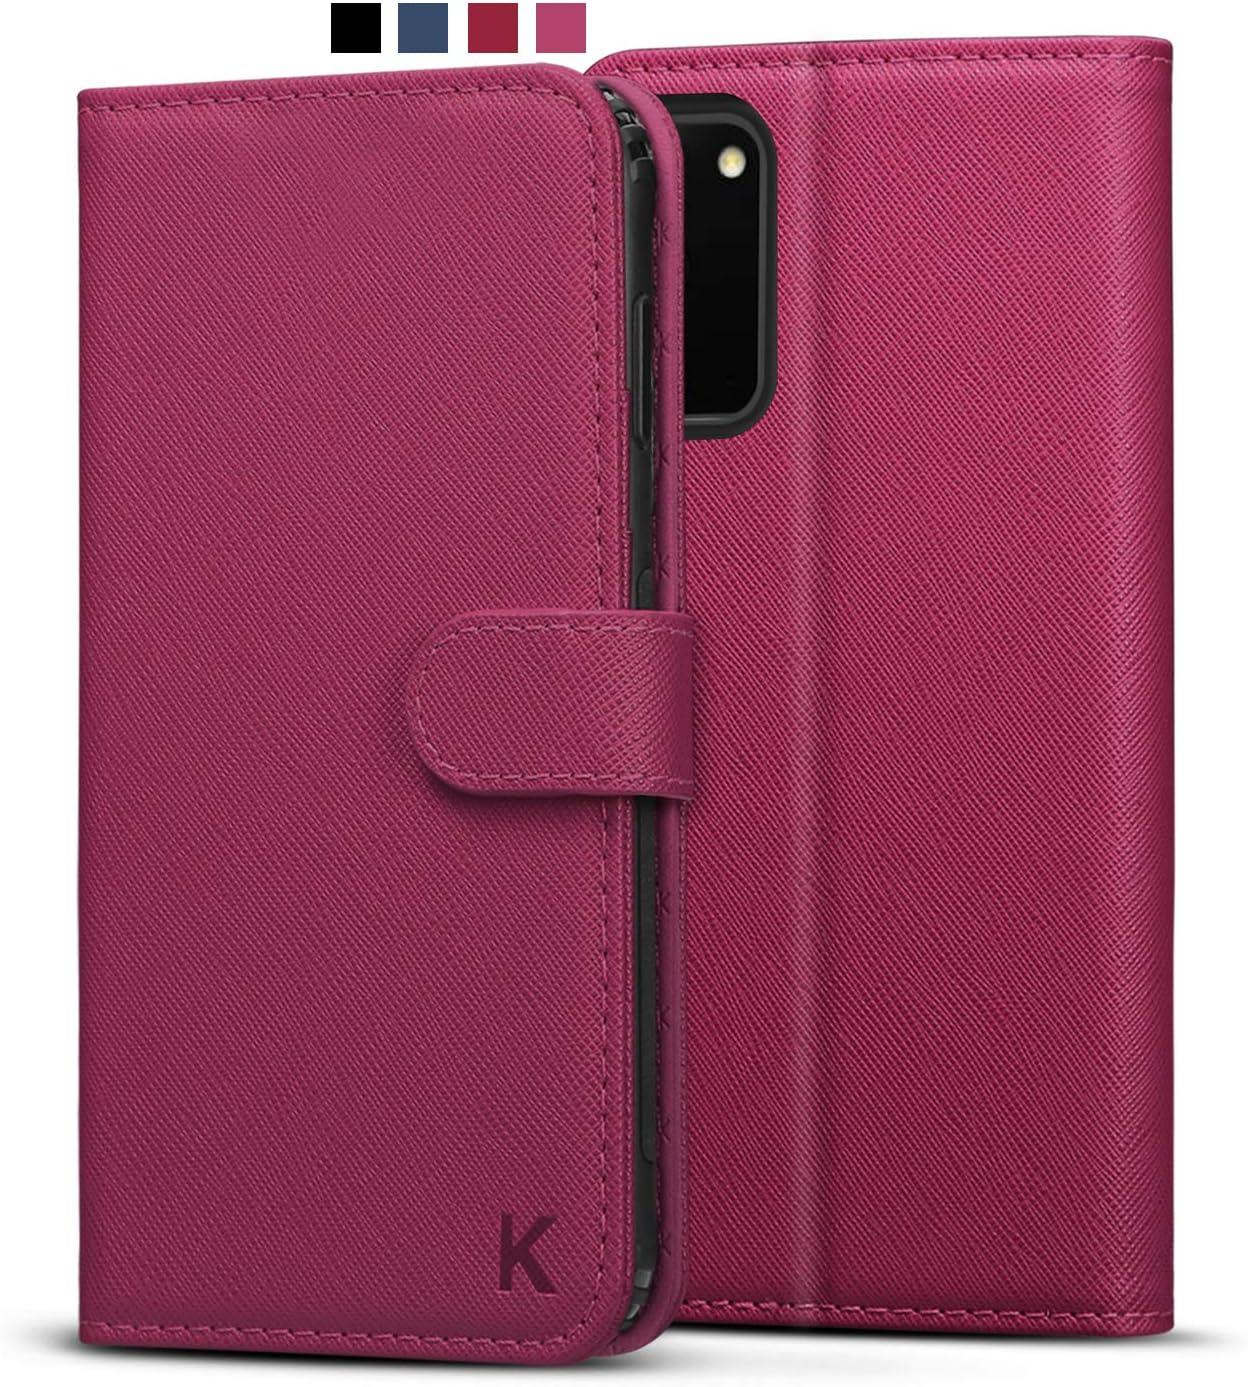 KILINO Samsung Galaxy S20 Wallet Case [PU Leather] [Soft TPU] [RFID Blocking] [Shock-Absorbent Bumper] [Card Slots] [Kickstand] [Magnetic Closure] Flip Folio Cover for Samsung Galaxy S20 5G (Magenta)